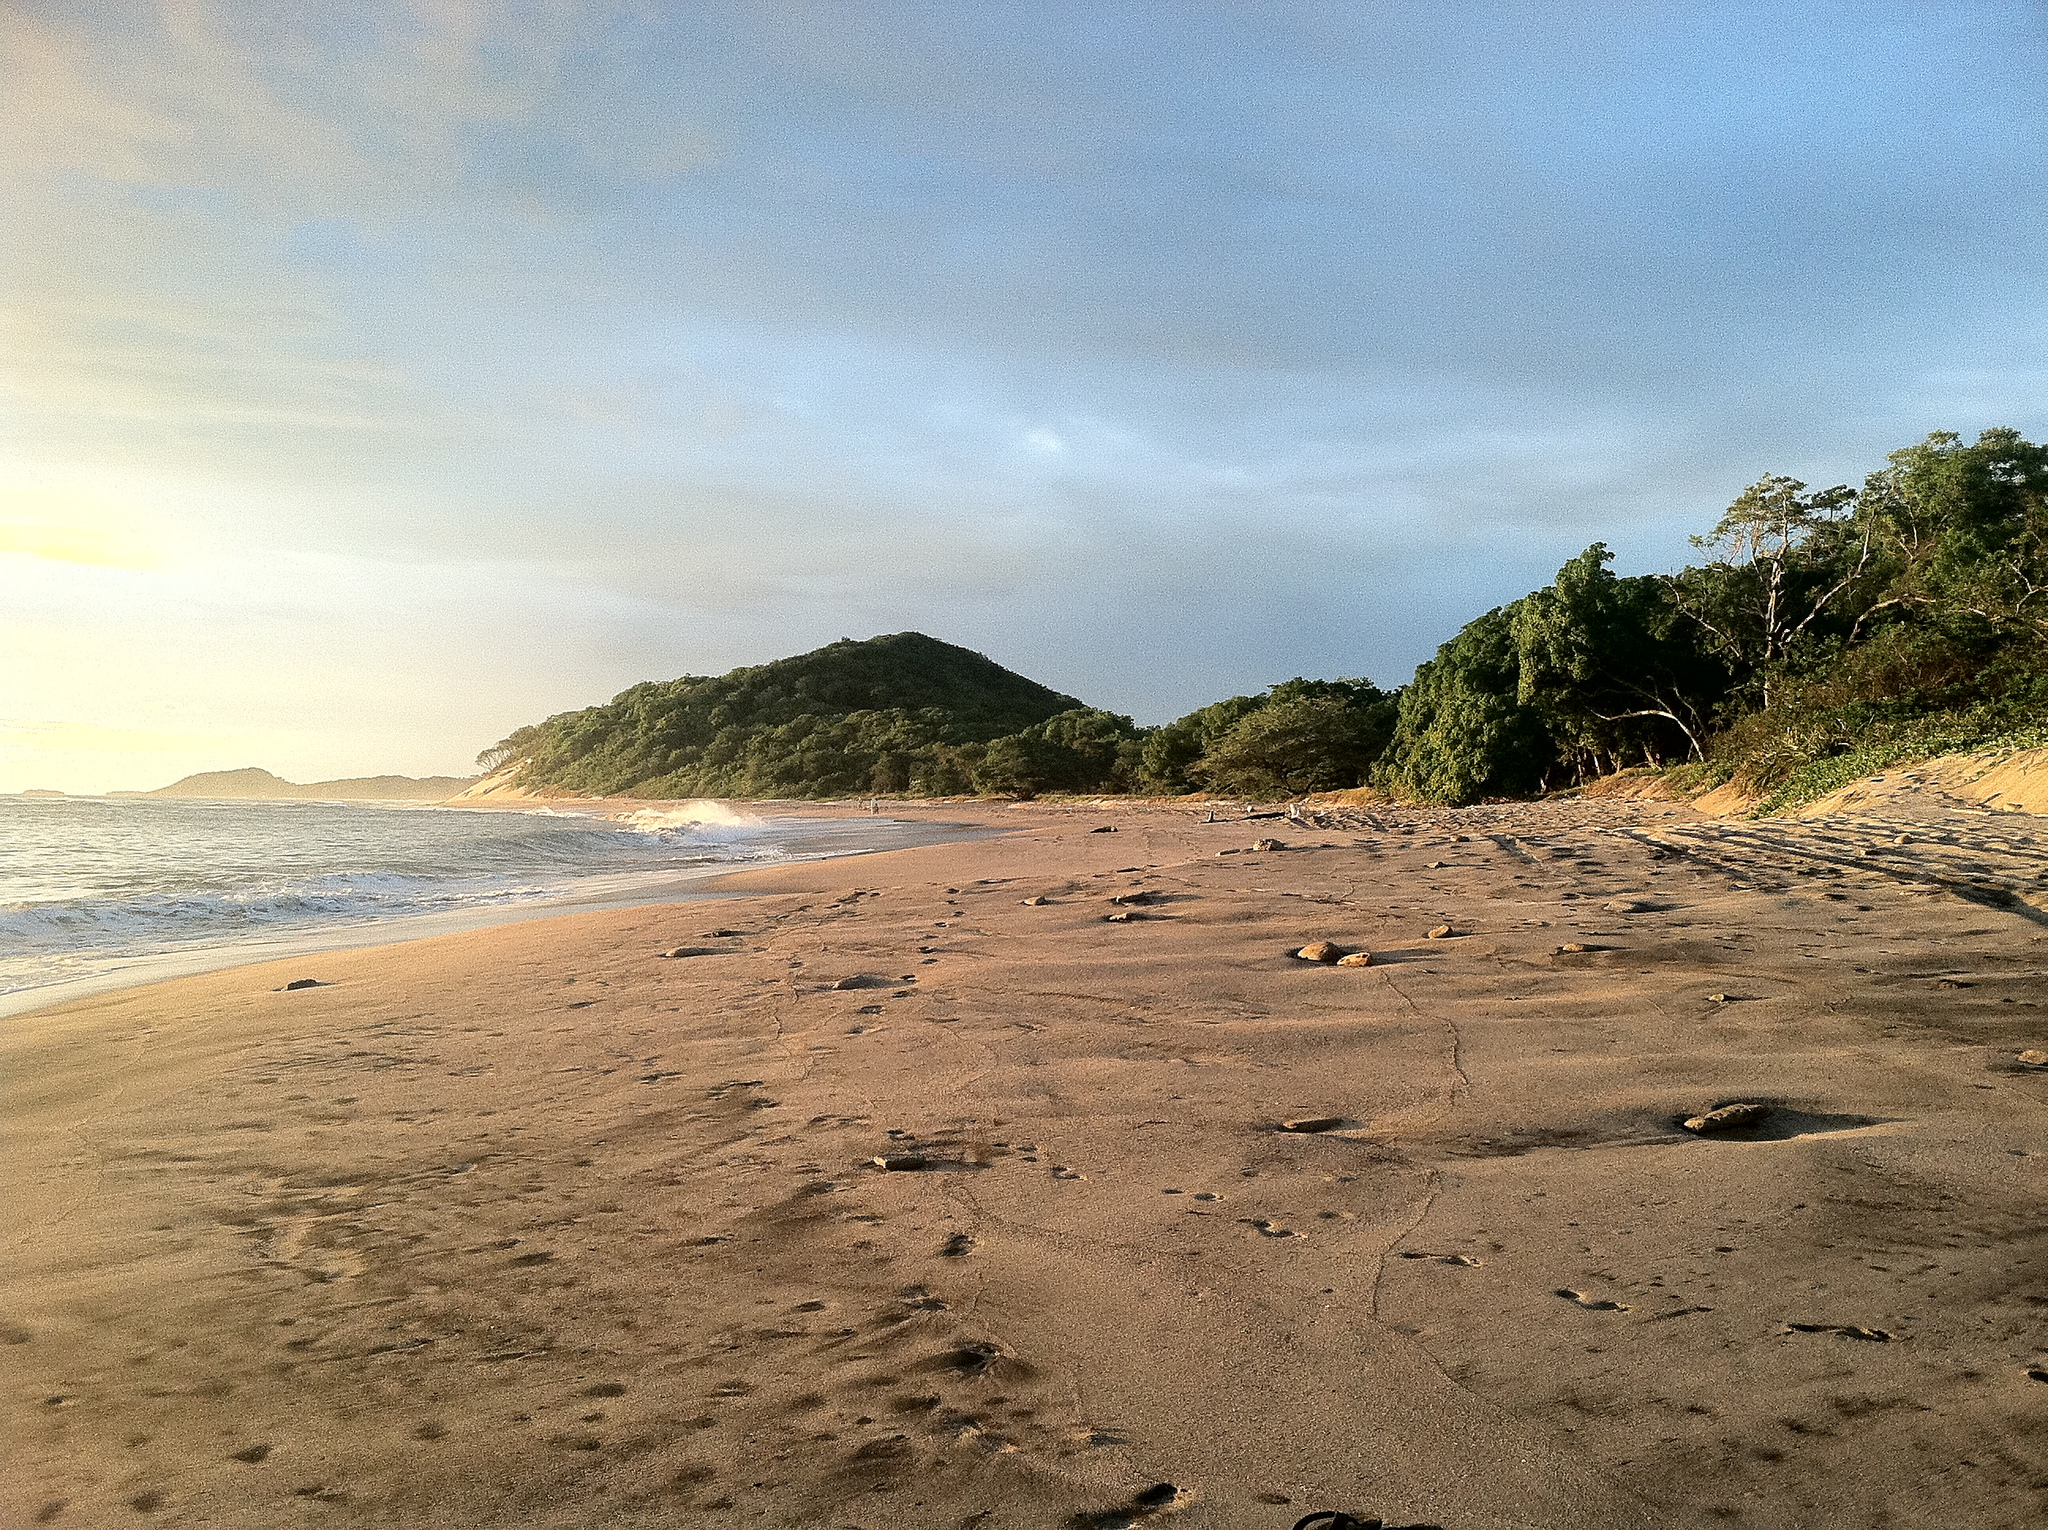 A photo of Popoyo Beach, a beautiful spot near the clinic.